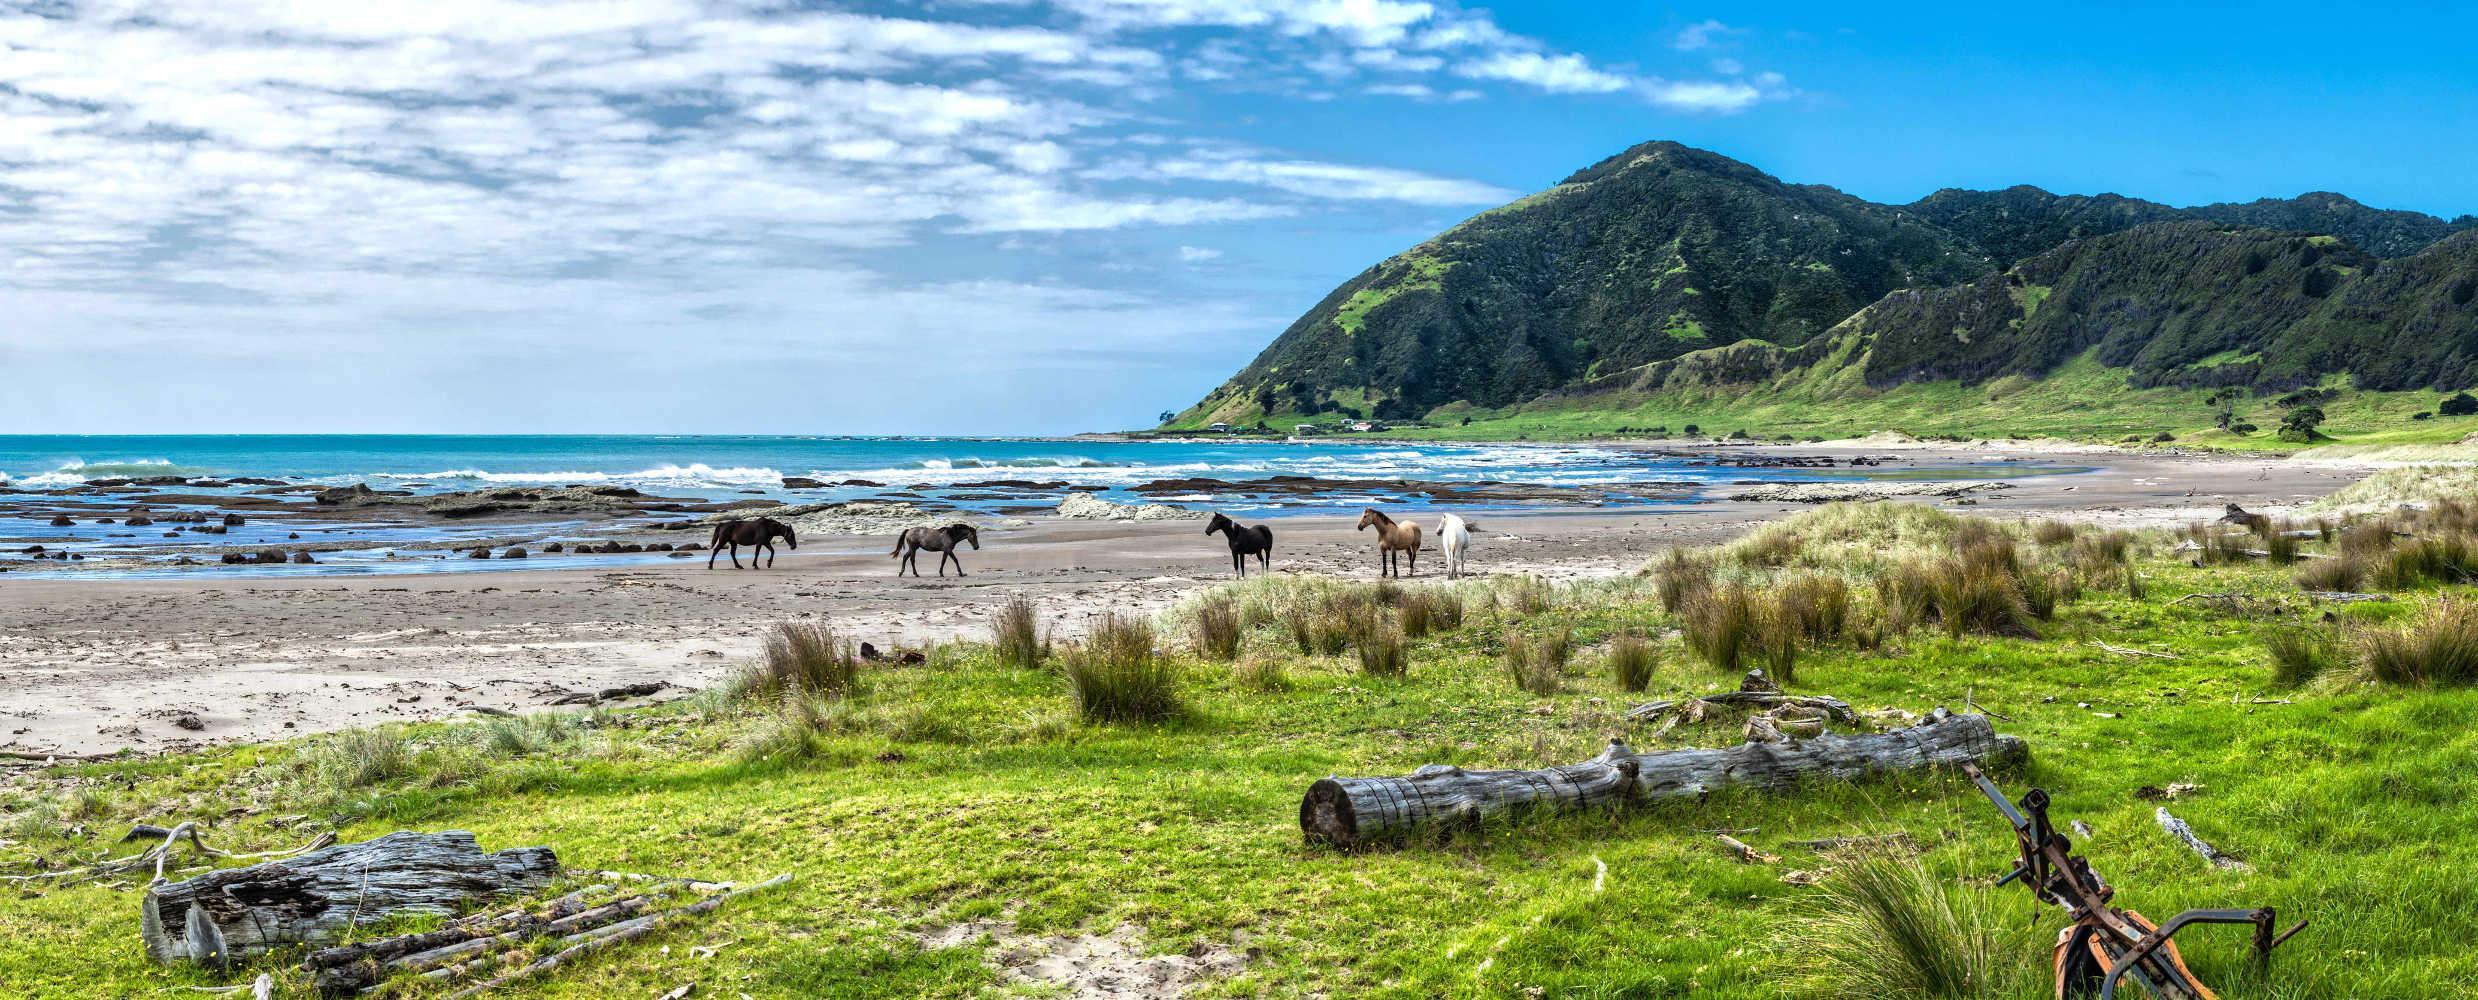 Hicks Bay beach with local inhabitants, wild horses,New Zealand